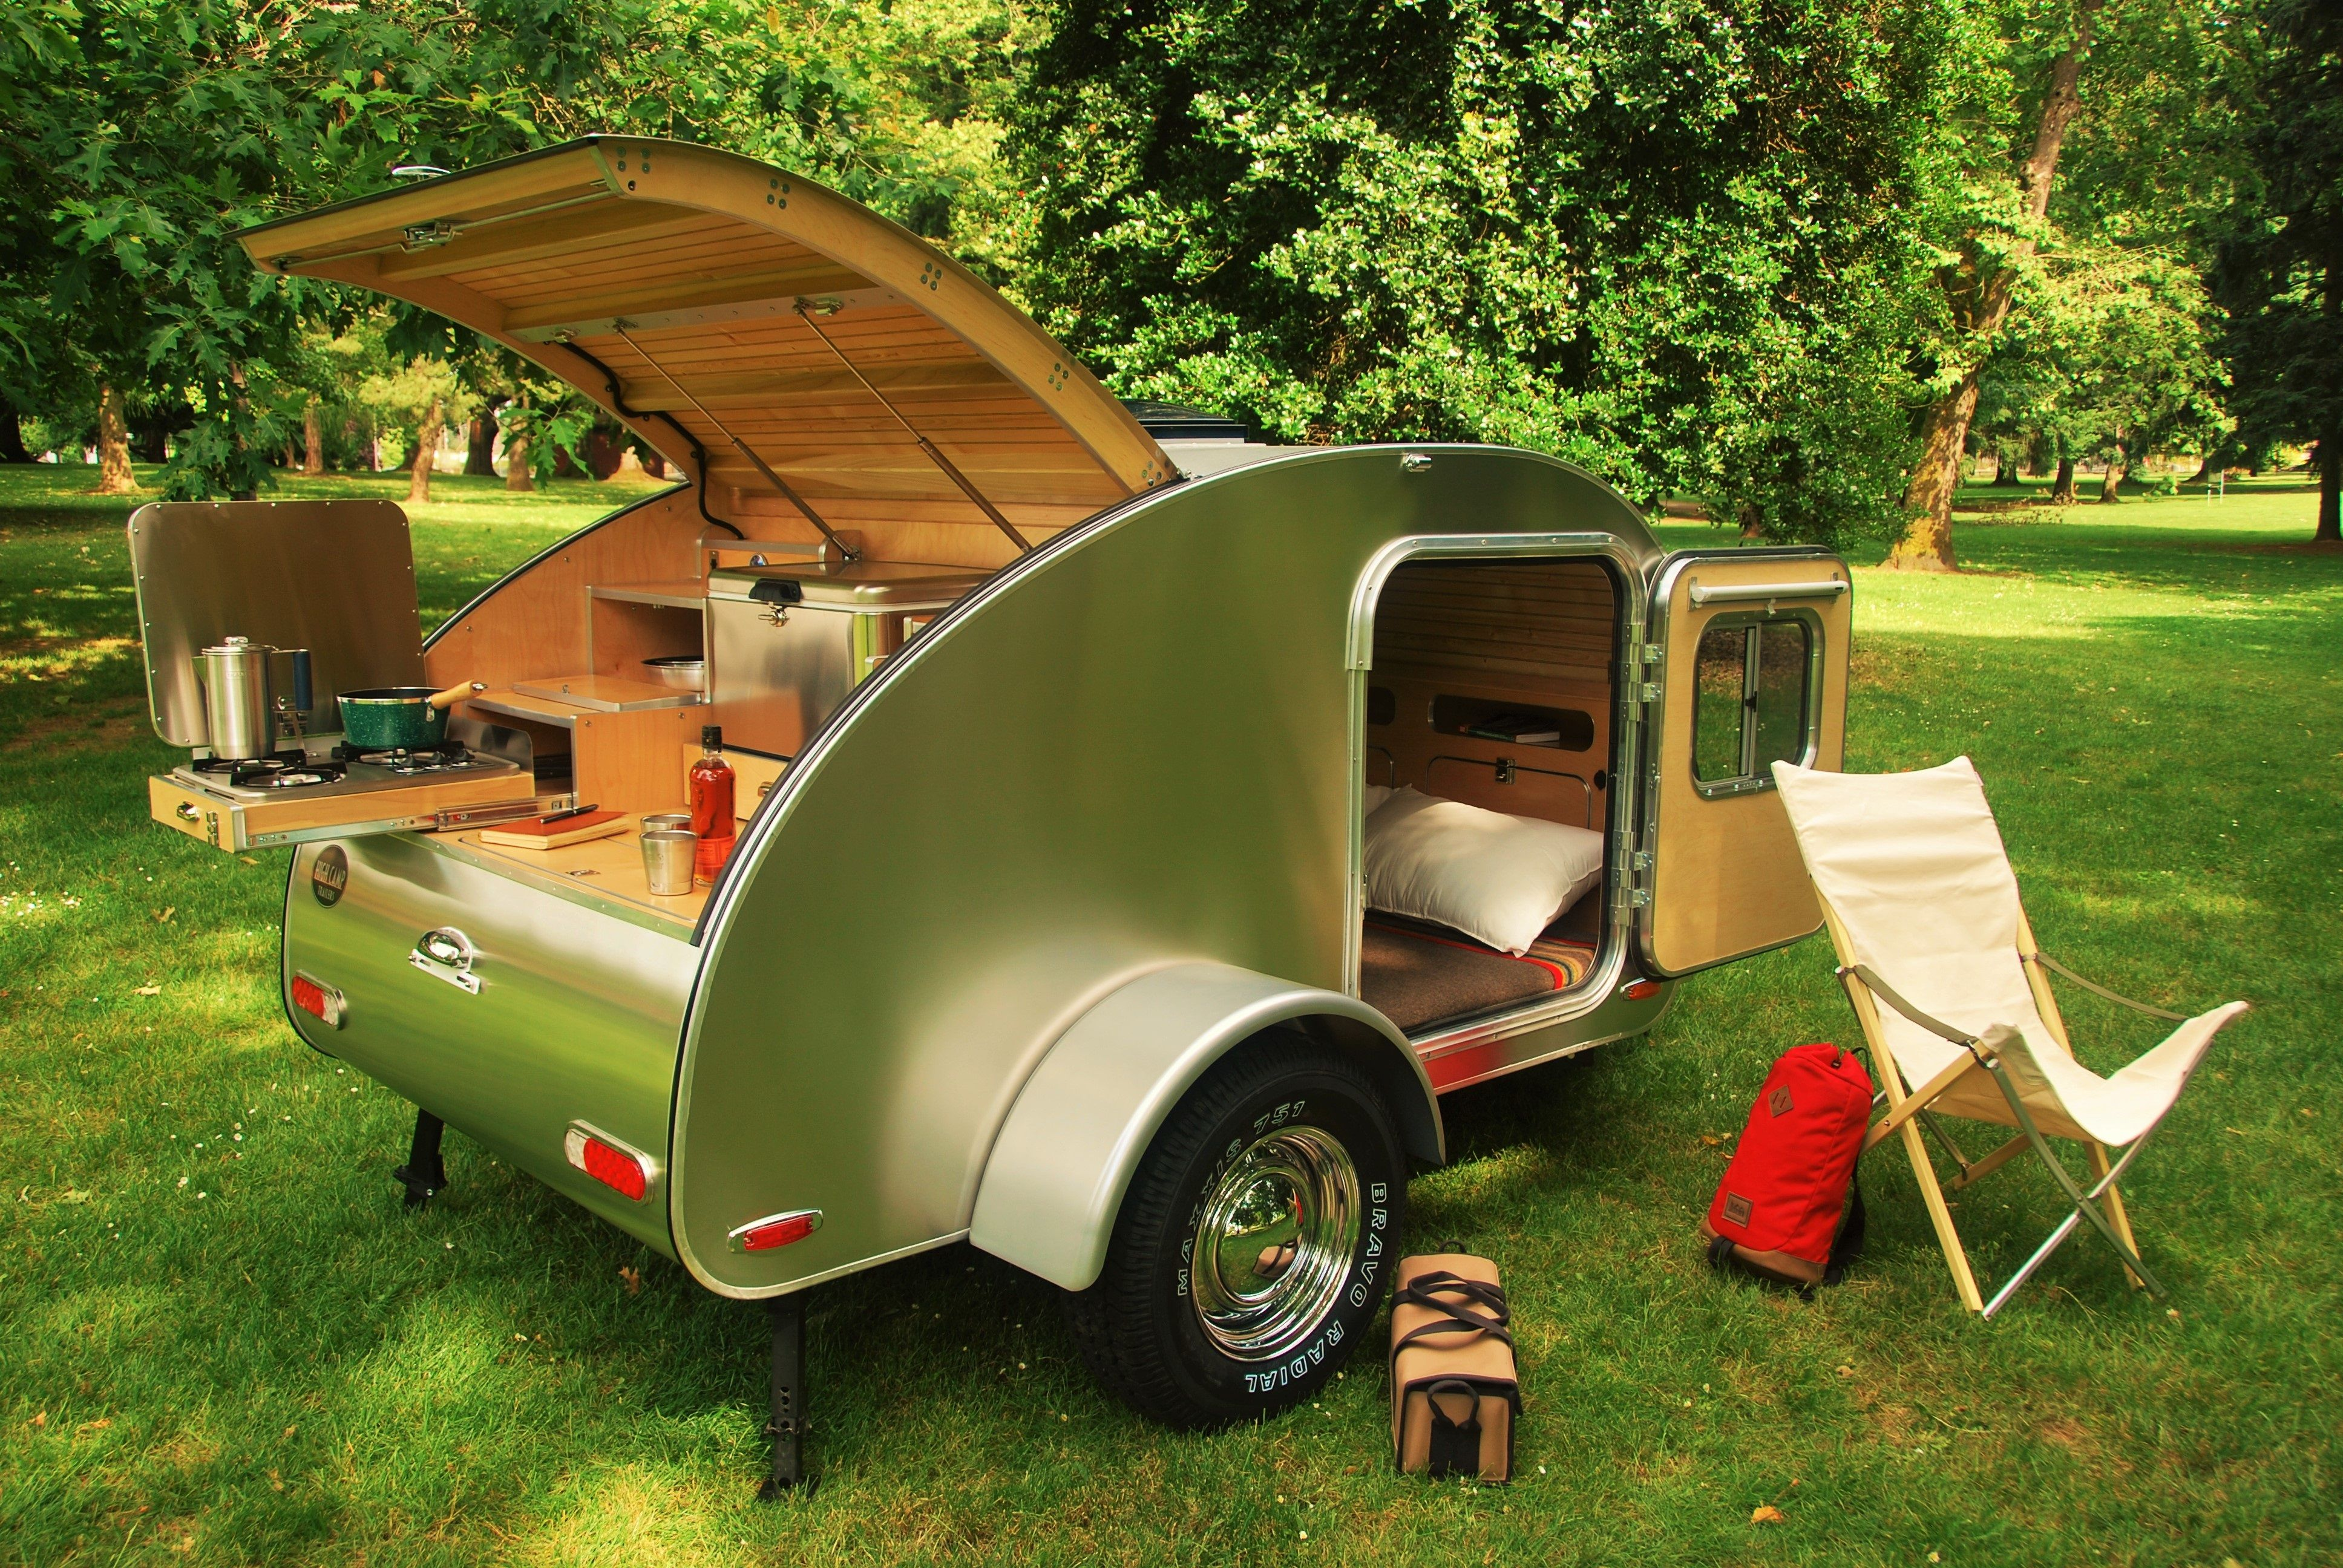 High Camp Trailers' classic teardrop trailer built in